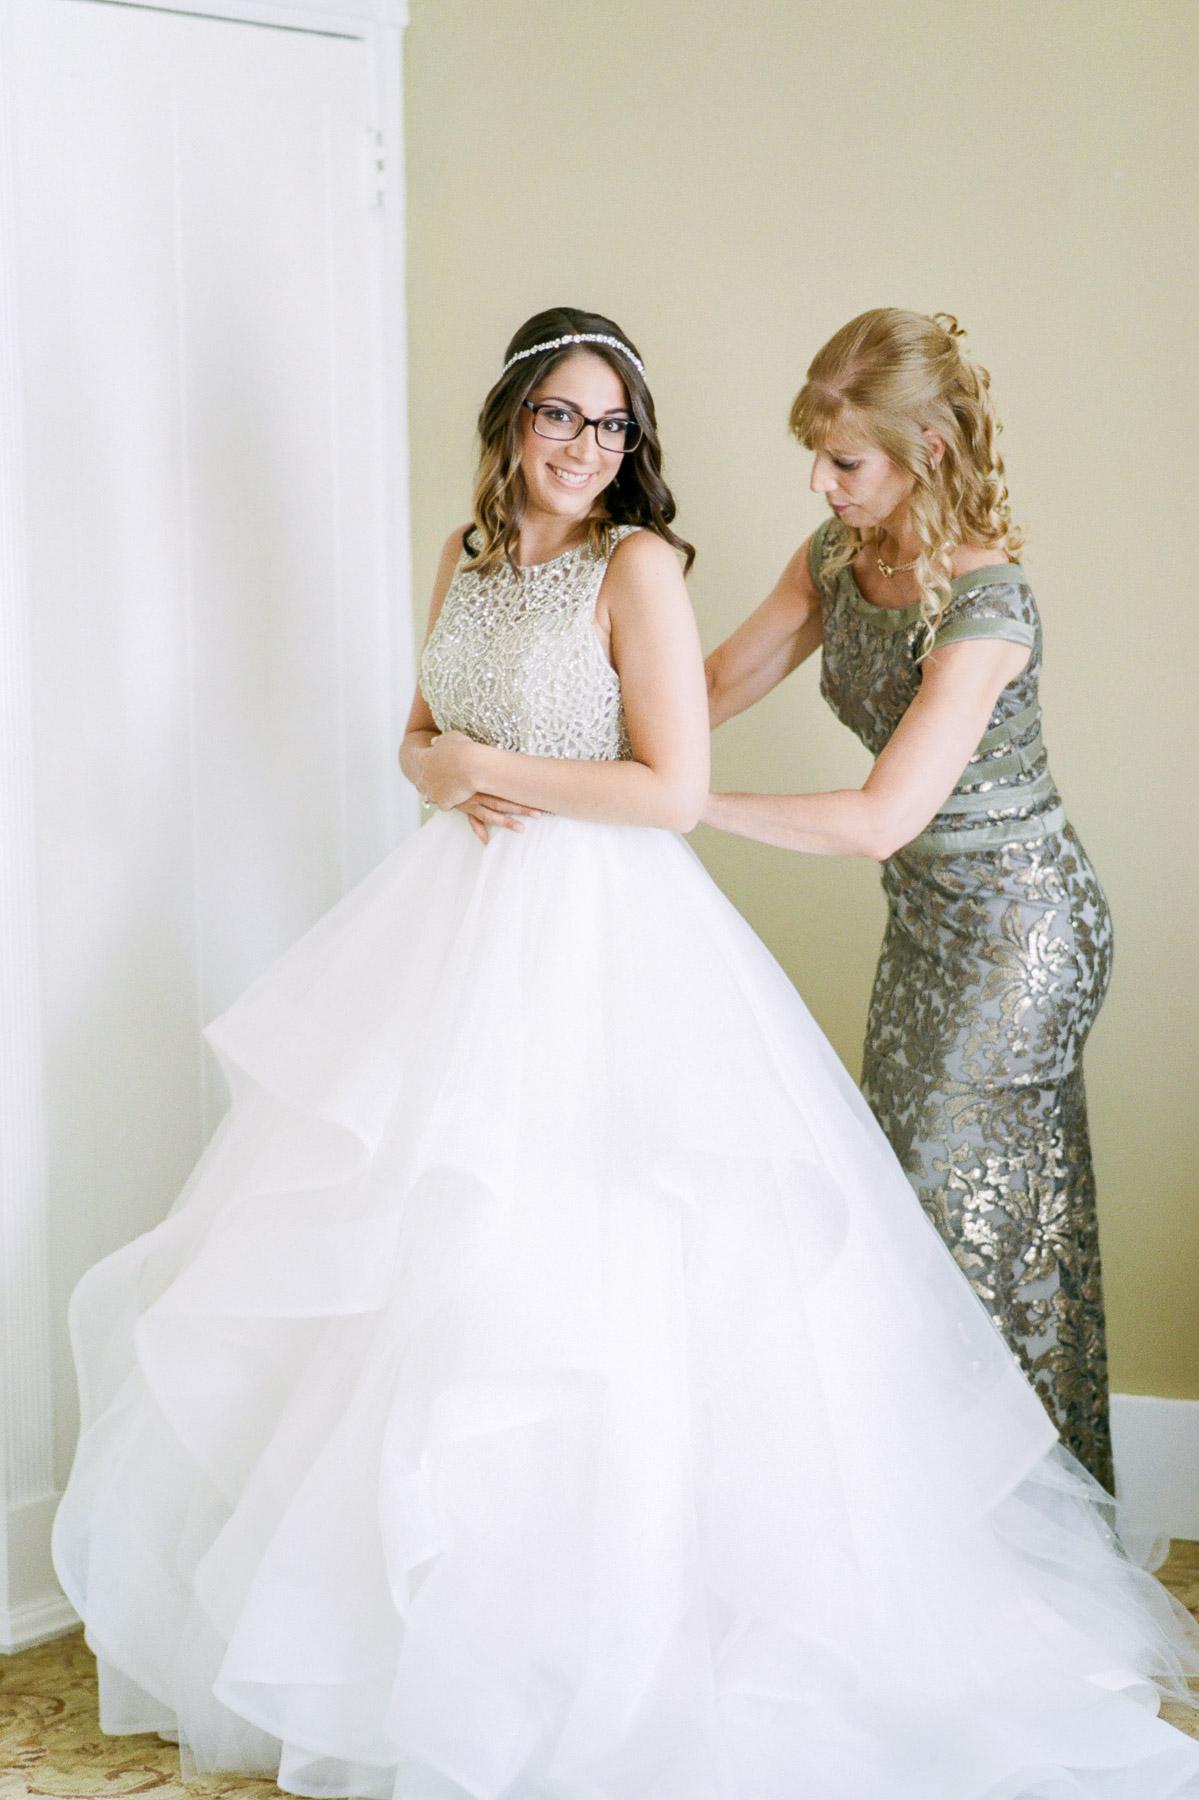 38840e6cfa1e7 Michelle Lange: Wedding & Engagement Photography NY Blog